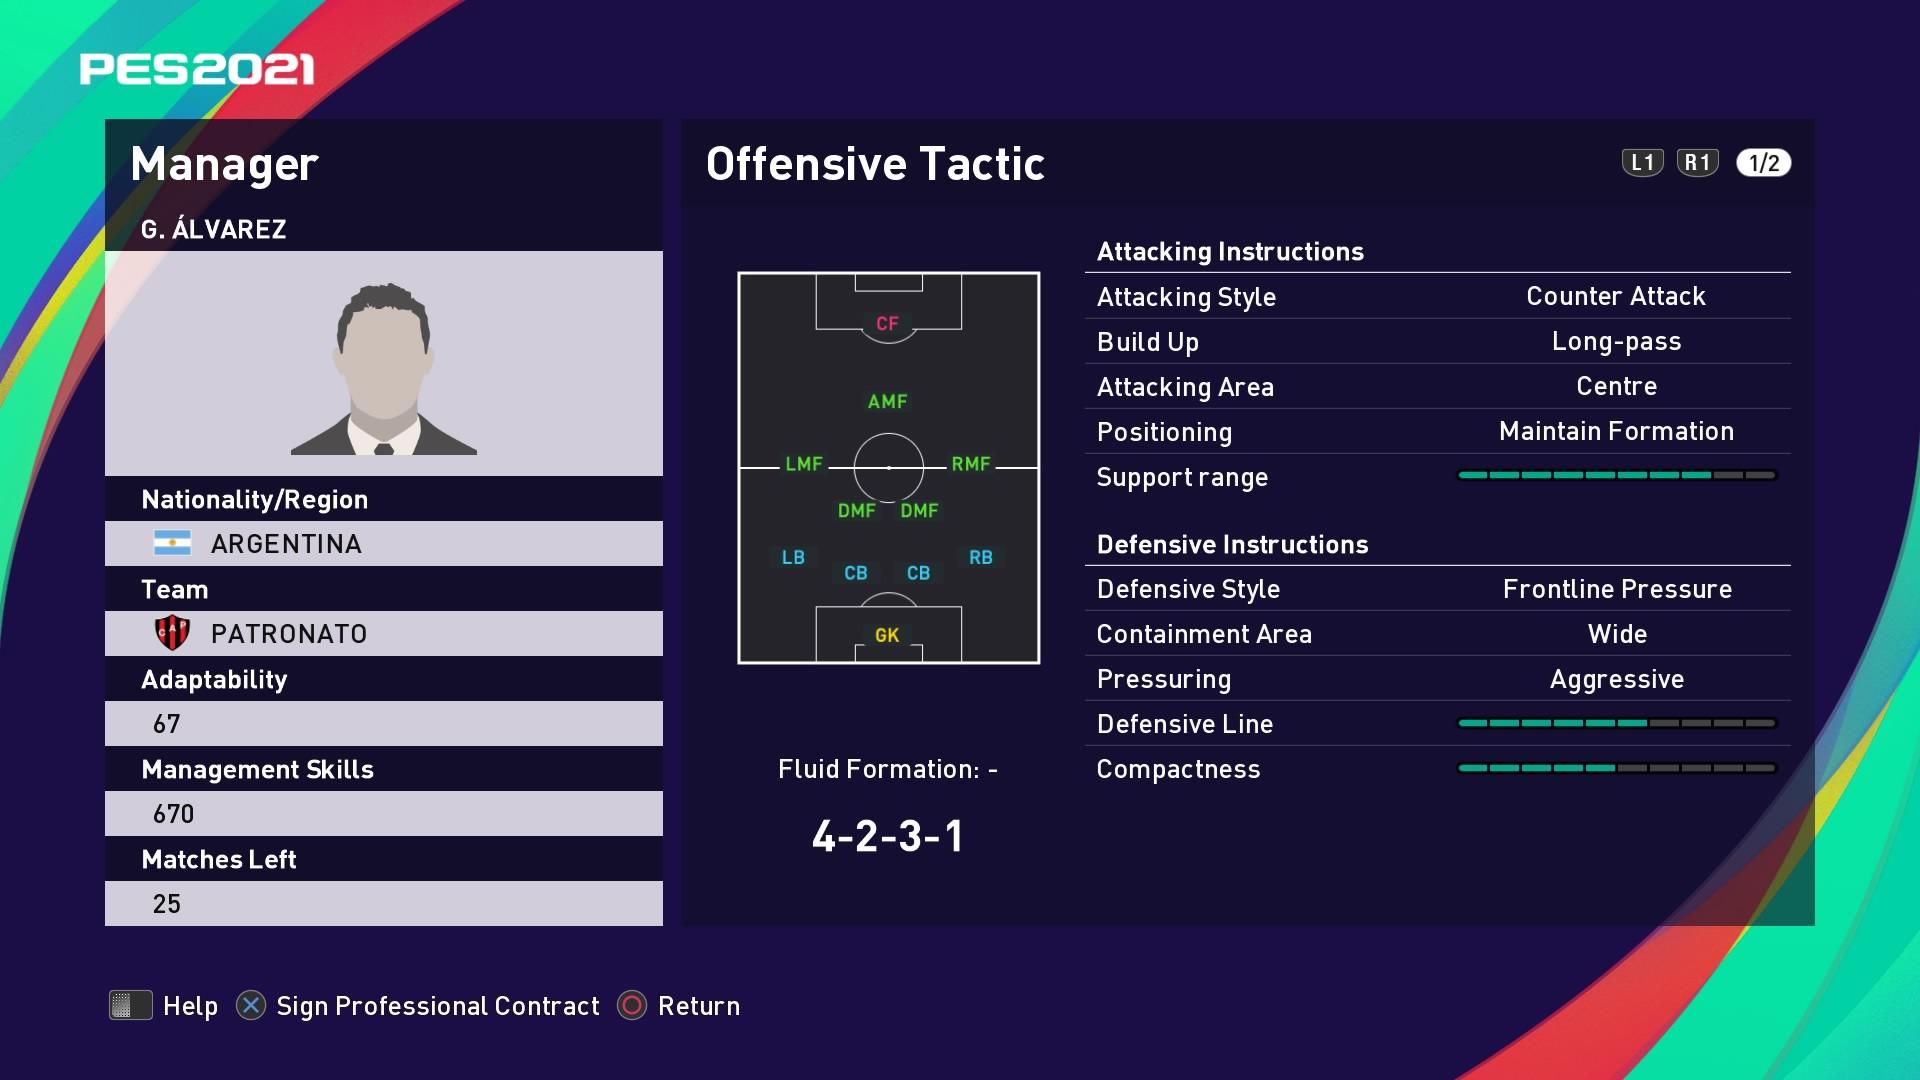 G. Álvarez (Mario Sciacqua) Offensive Tactic in PES 2021 myClub